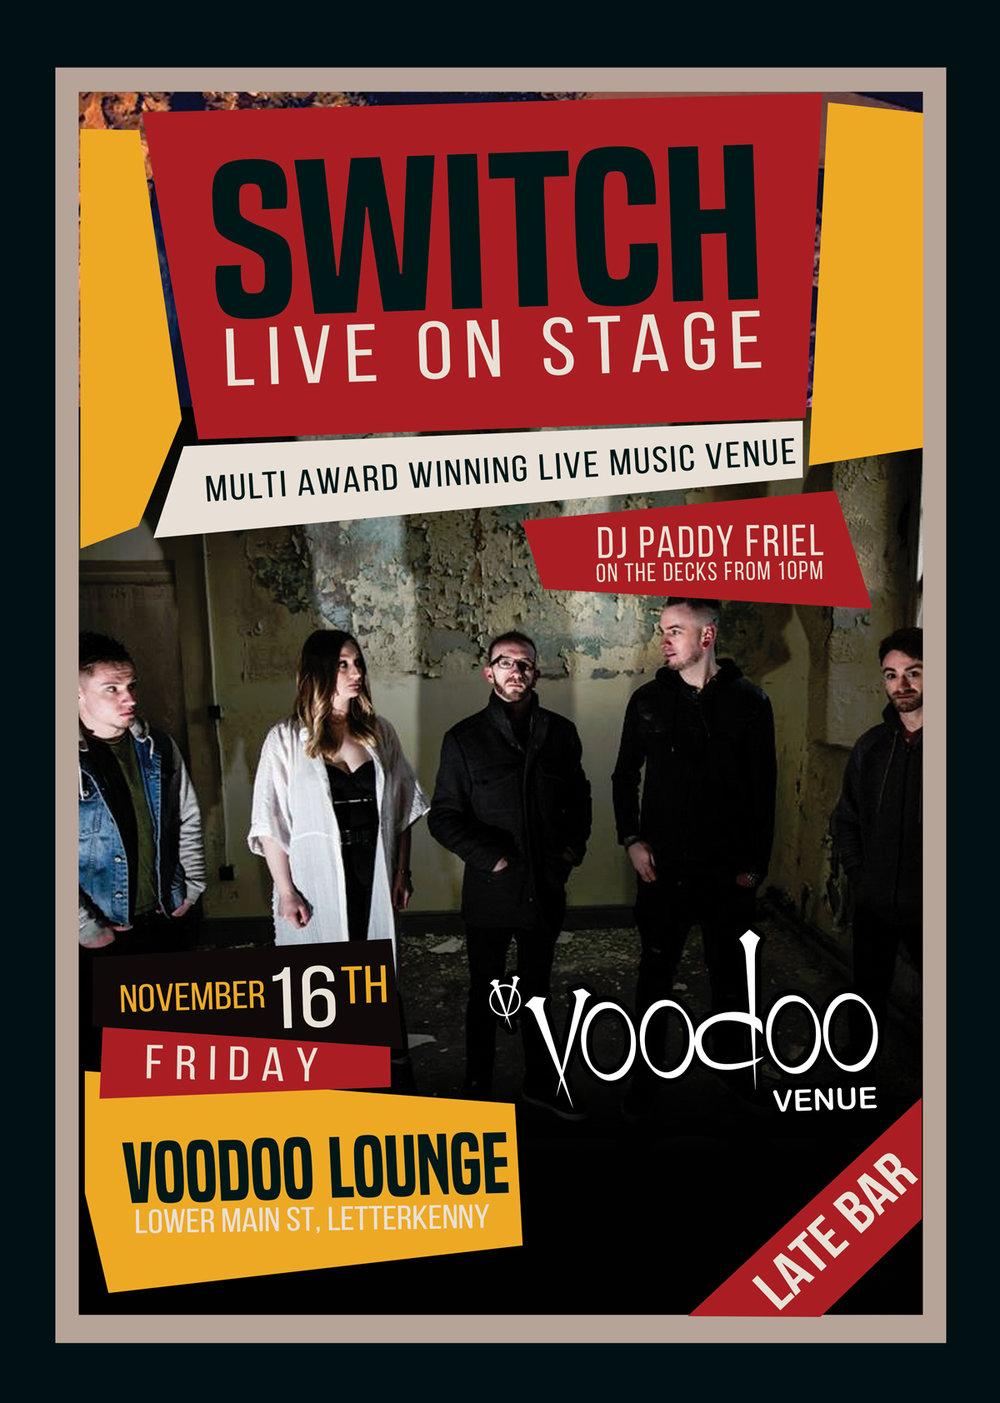 VOODOO-VENUE---switch-fri-nov-16-2018.jpg